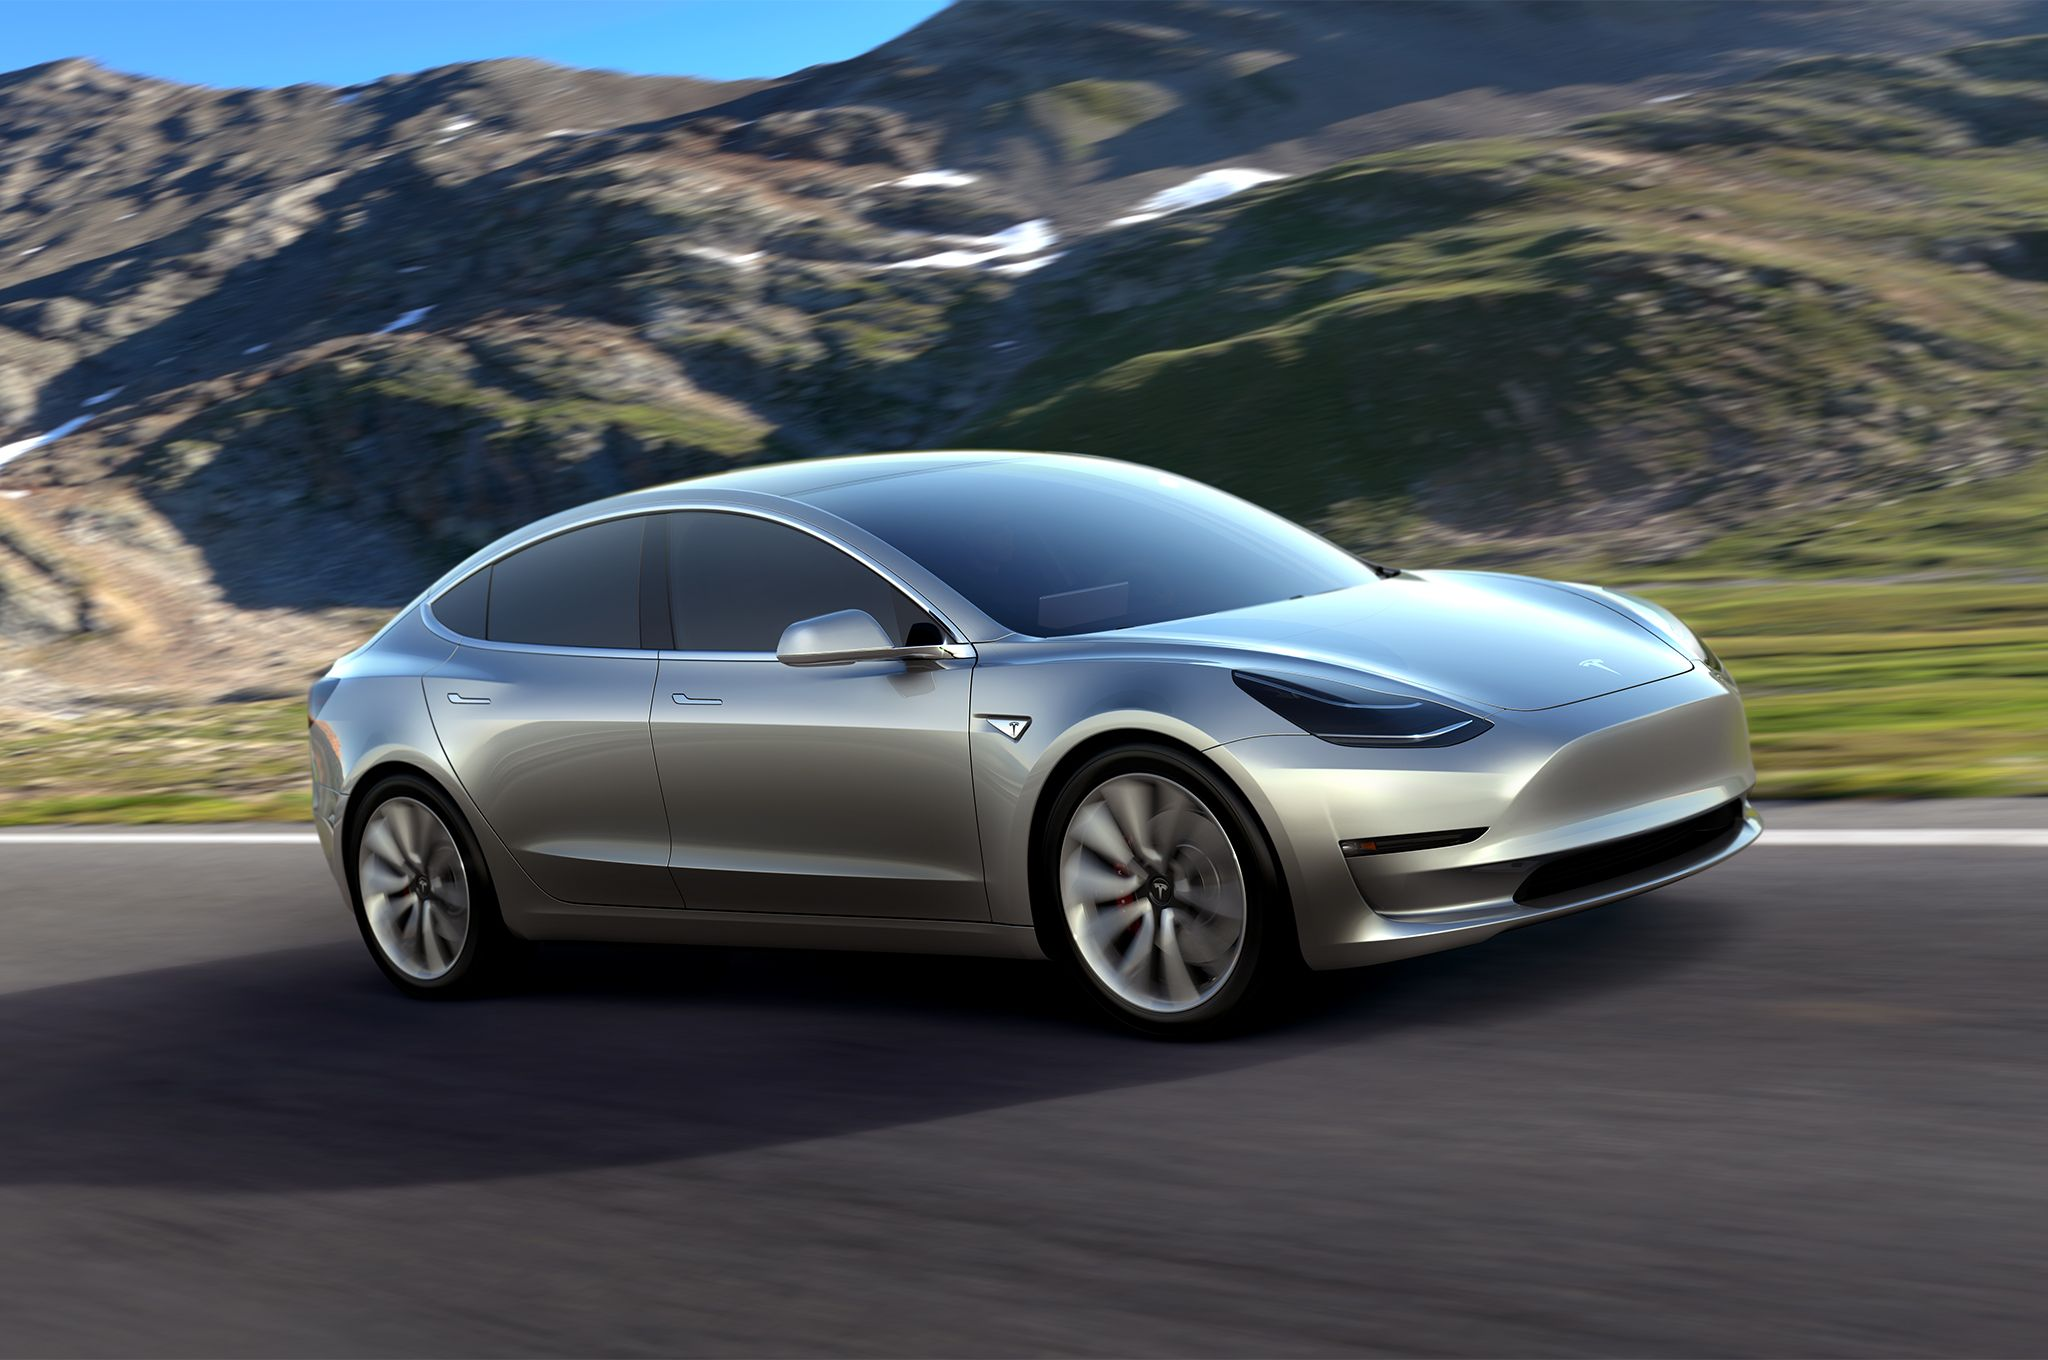 Read Motor Trend S Tesla Model 3 Review To Get The Latest Information On Models Prices Specs Mpg Fuel Economy And Photo Tesla Model Tesla Car Tesla Model S